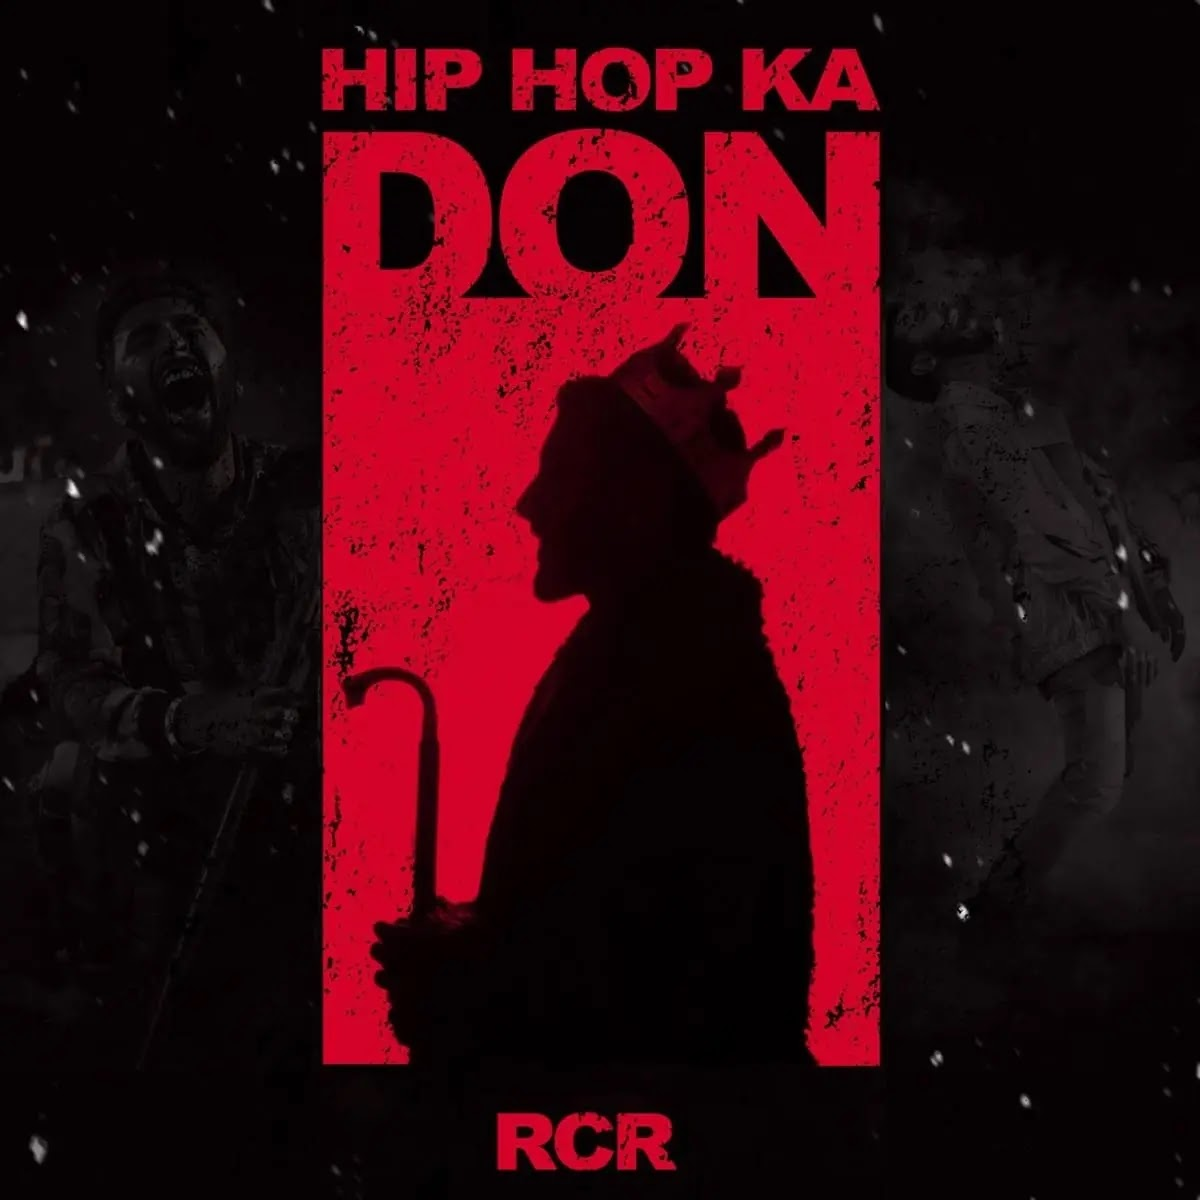 RCR Mp3 Song Download 320kbps Free